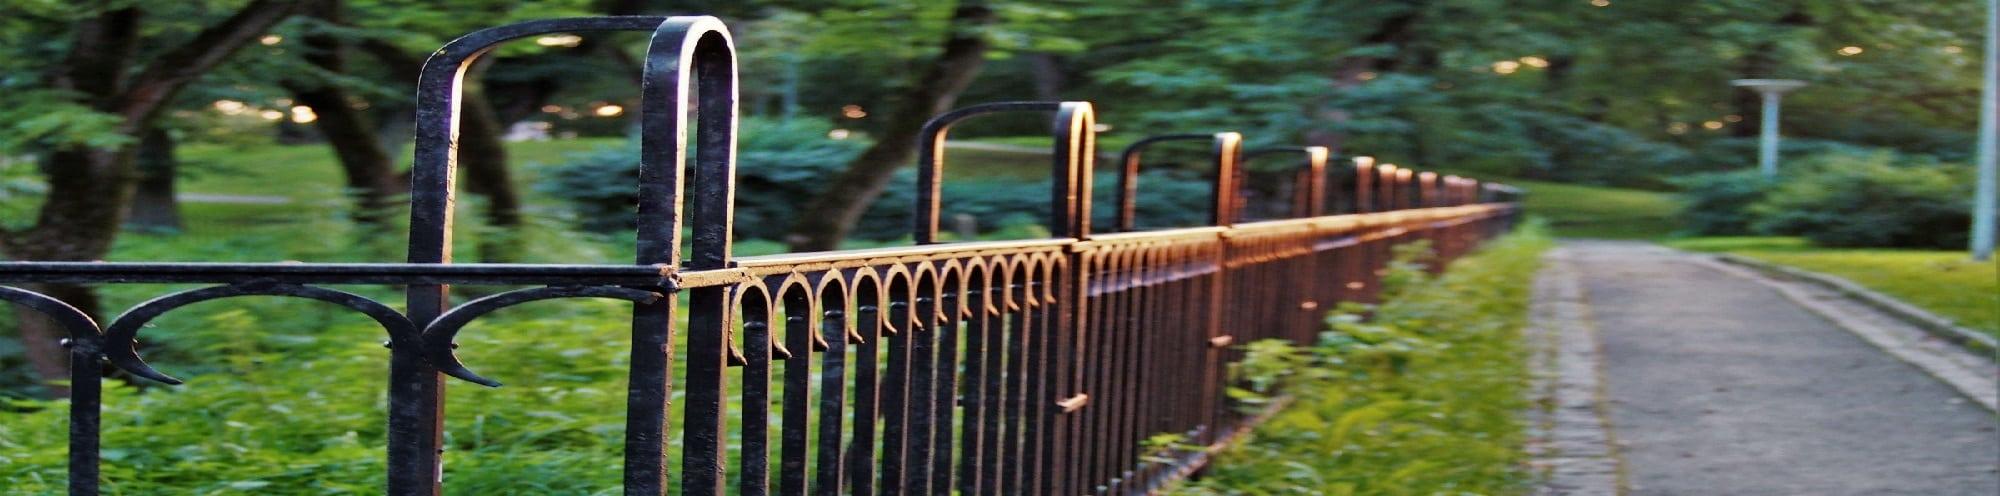 Iron Fence - Big Easy Iron Works